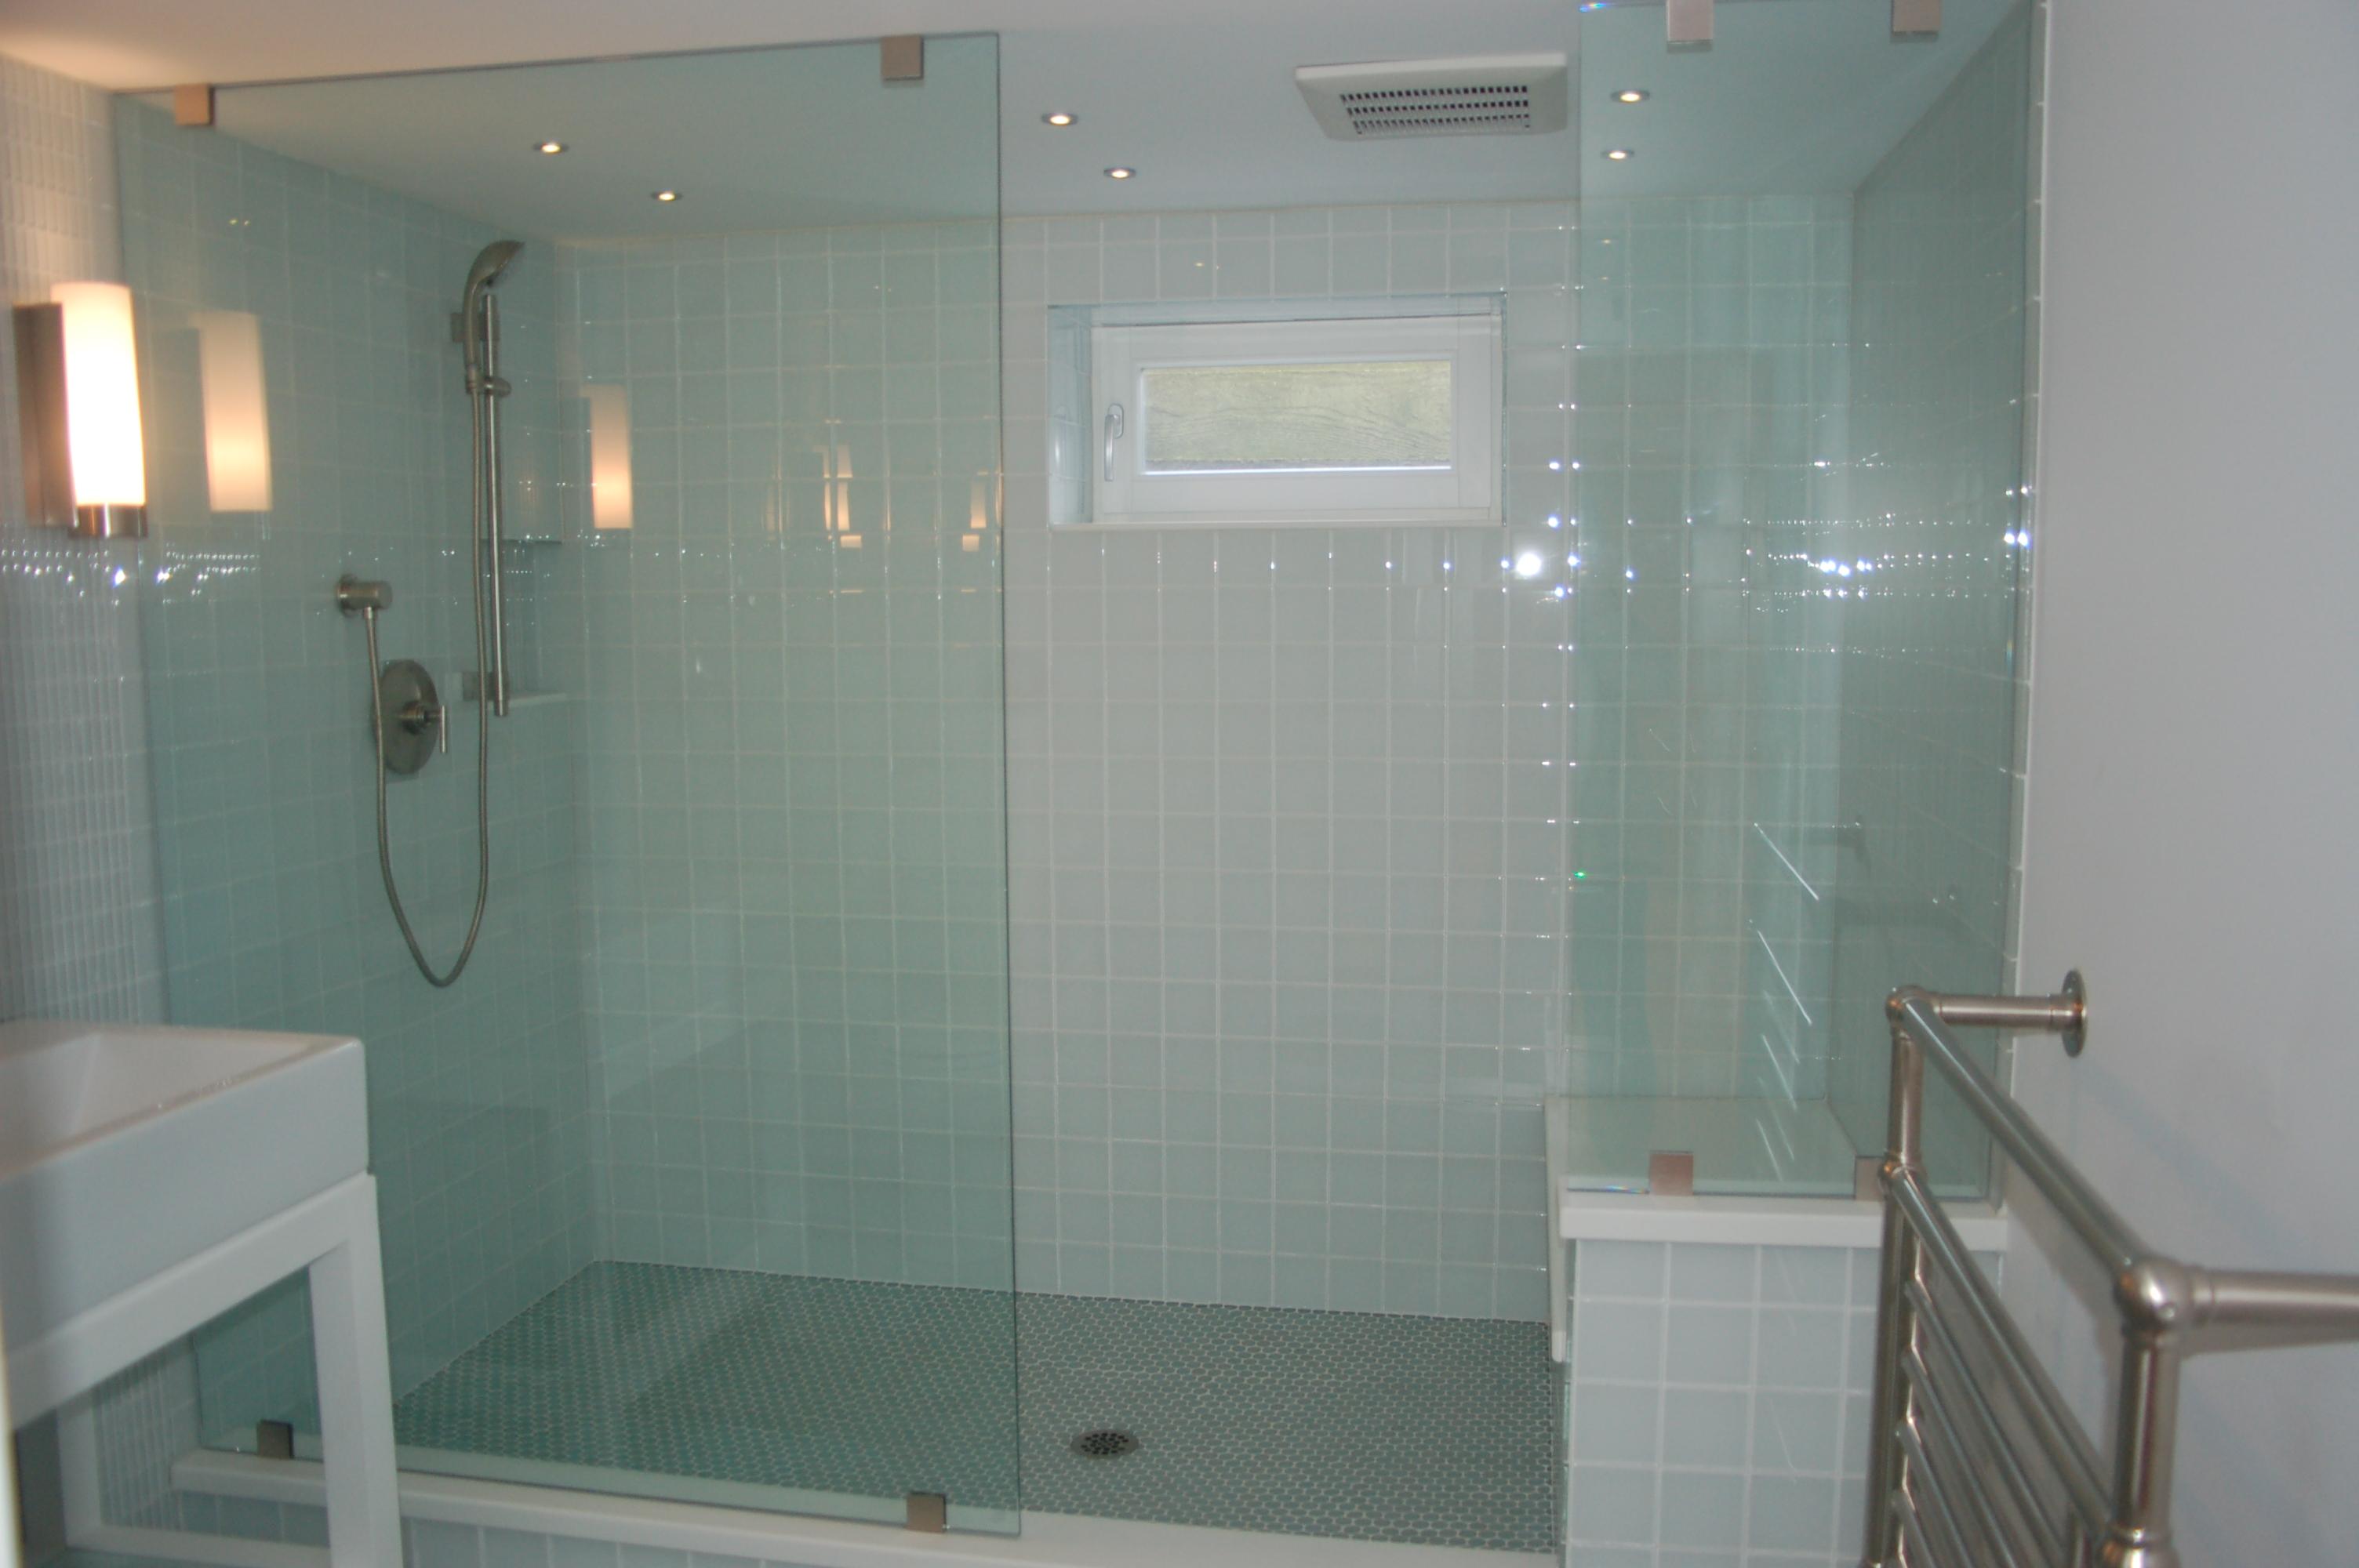 Bathroomb Q Bathroom Door Handles